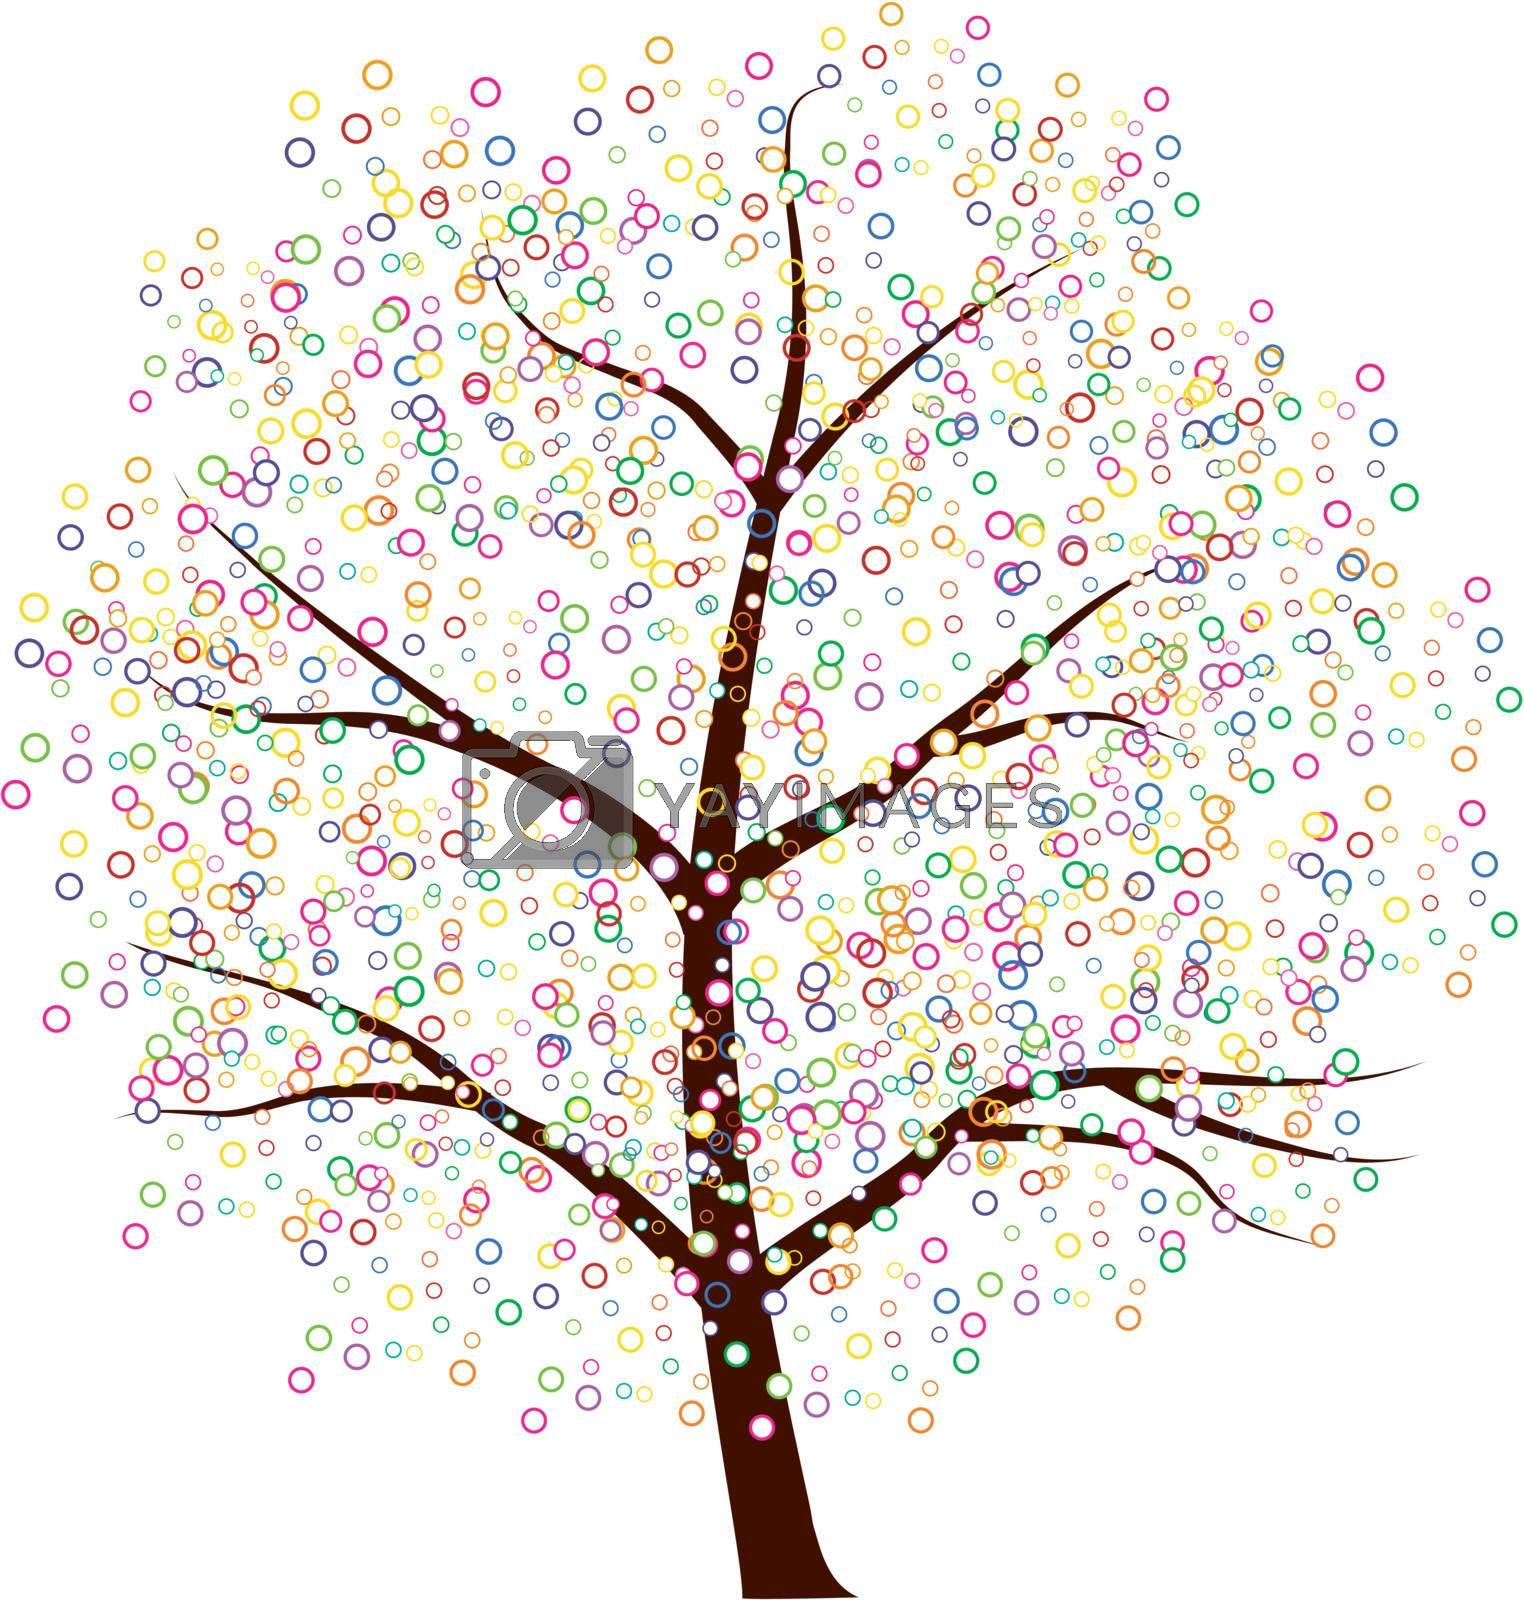 An image of a dot tree.